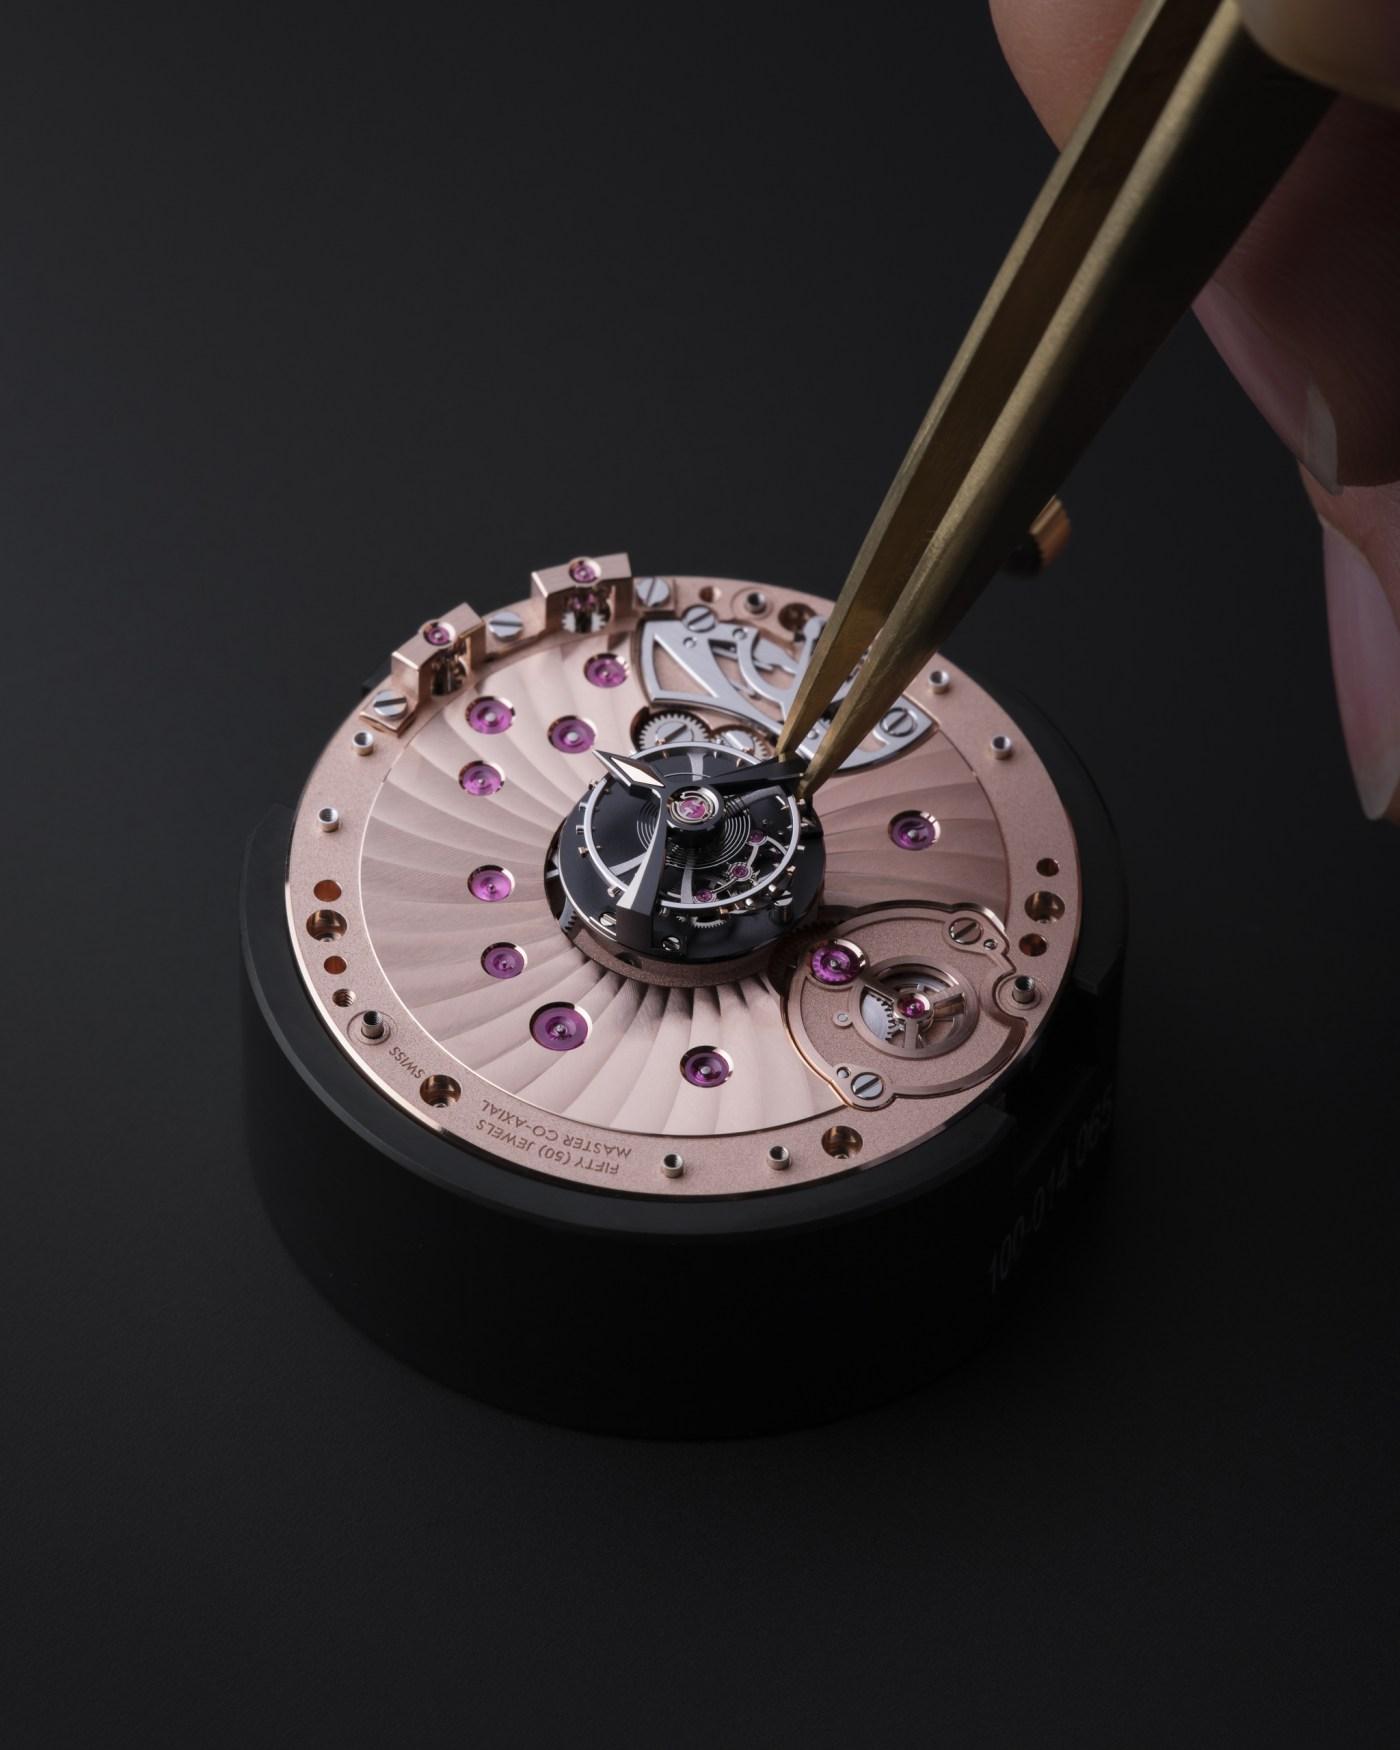 Omega De Ville Tourbillon Master Chronometer watchmaking assembly